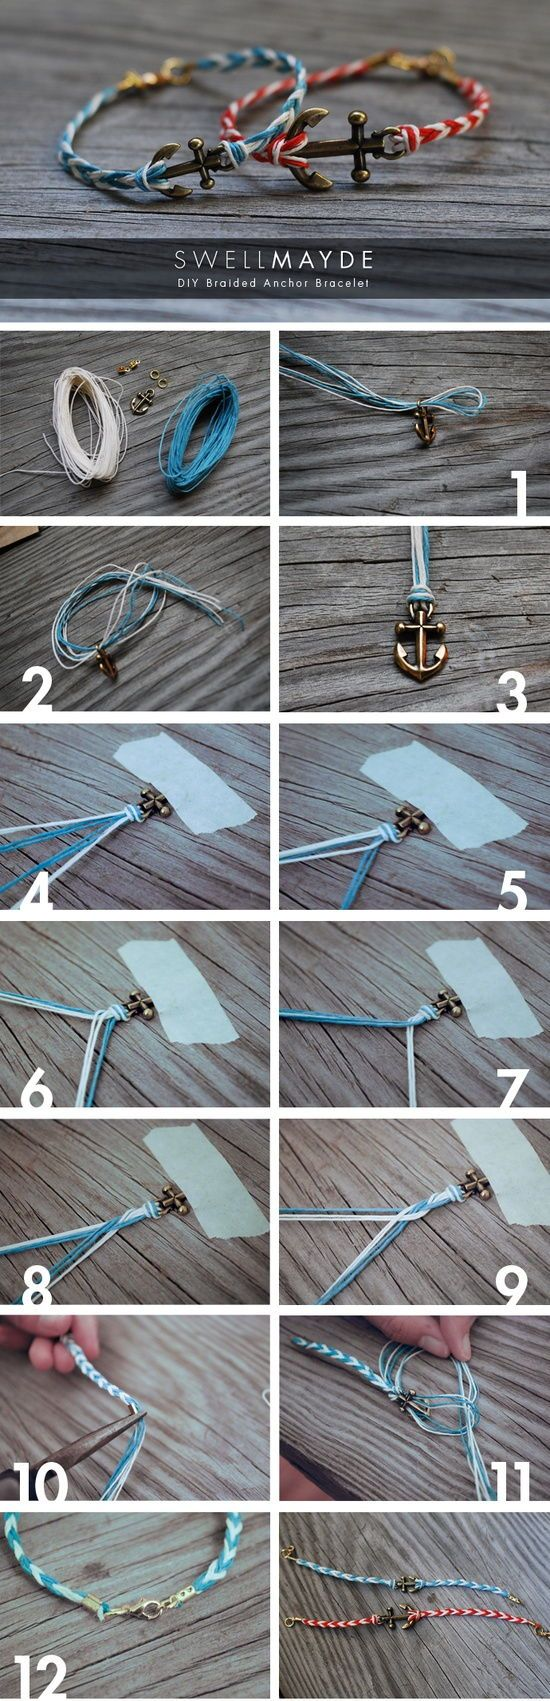 DIY Braided Anchor Bracelet DIY Braided Anchor Bracelet